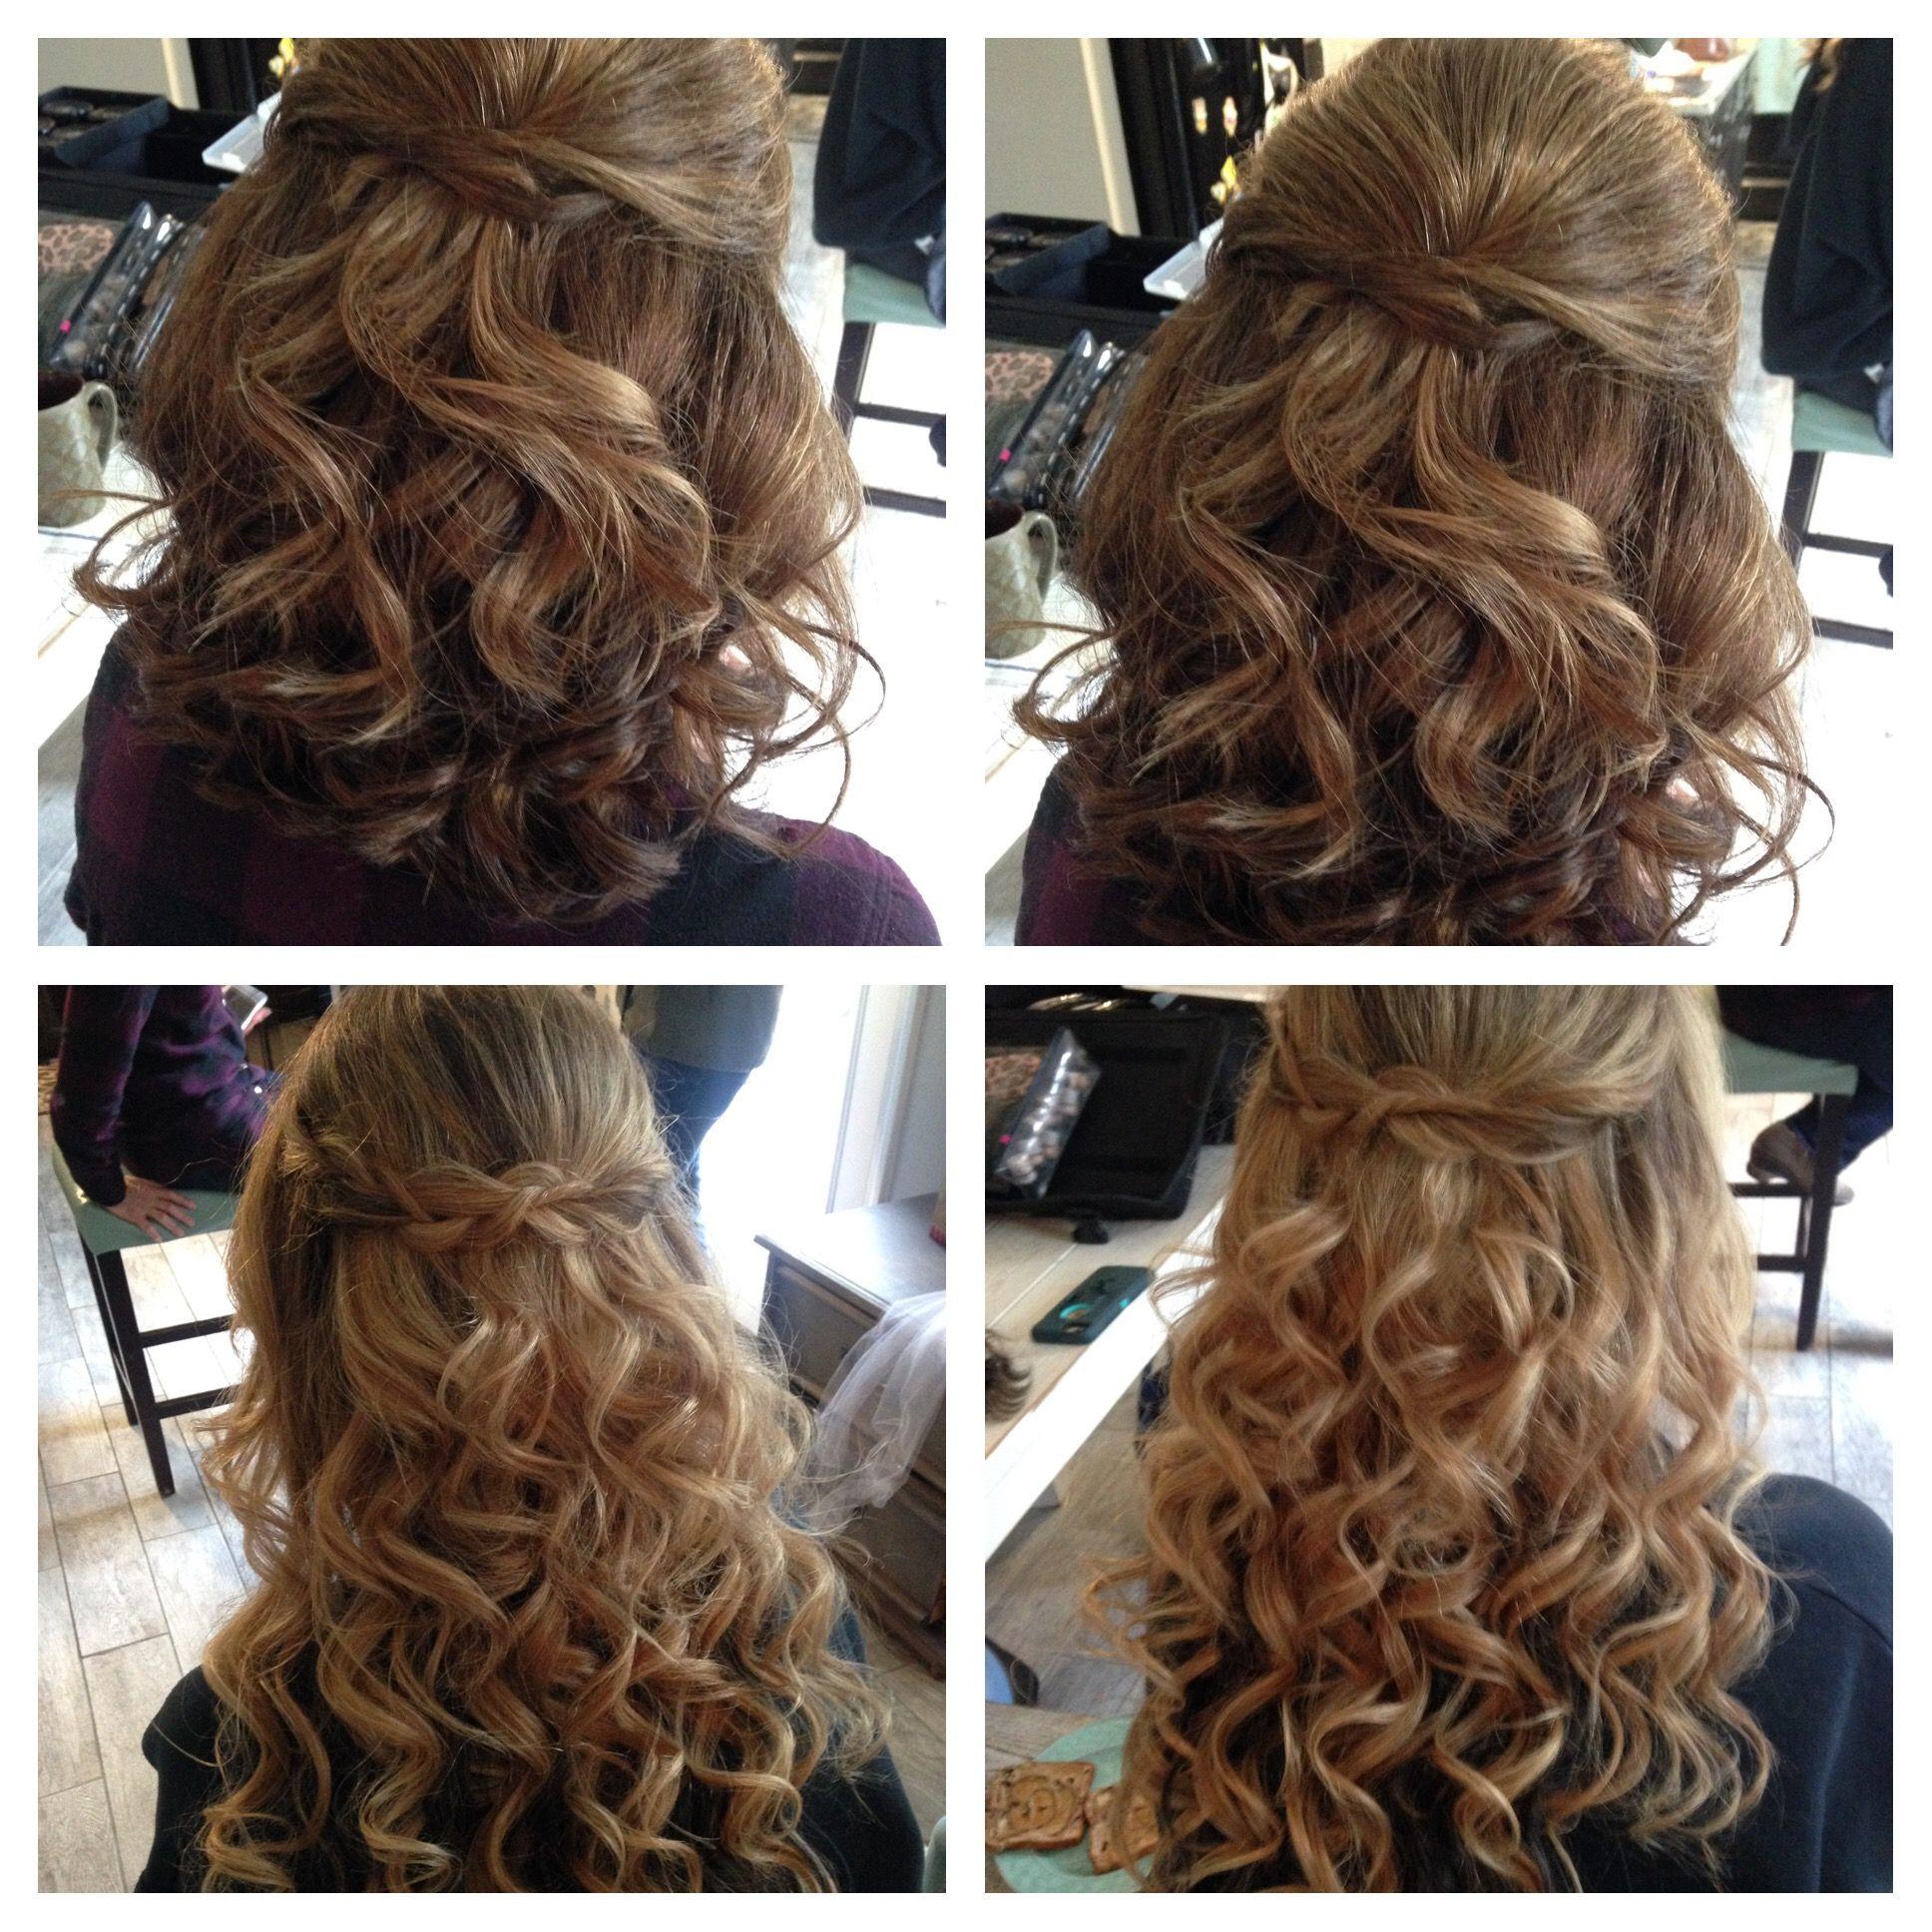 Hair Extensions By Jamie Teambride Wilmington Nc 888 519 1118